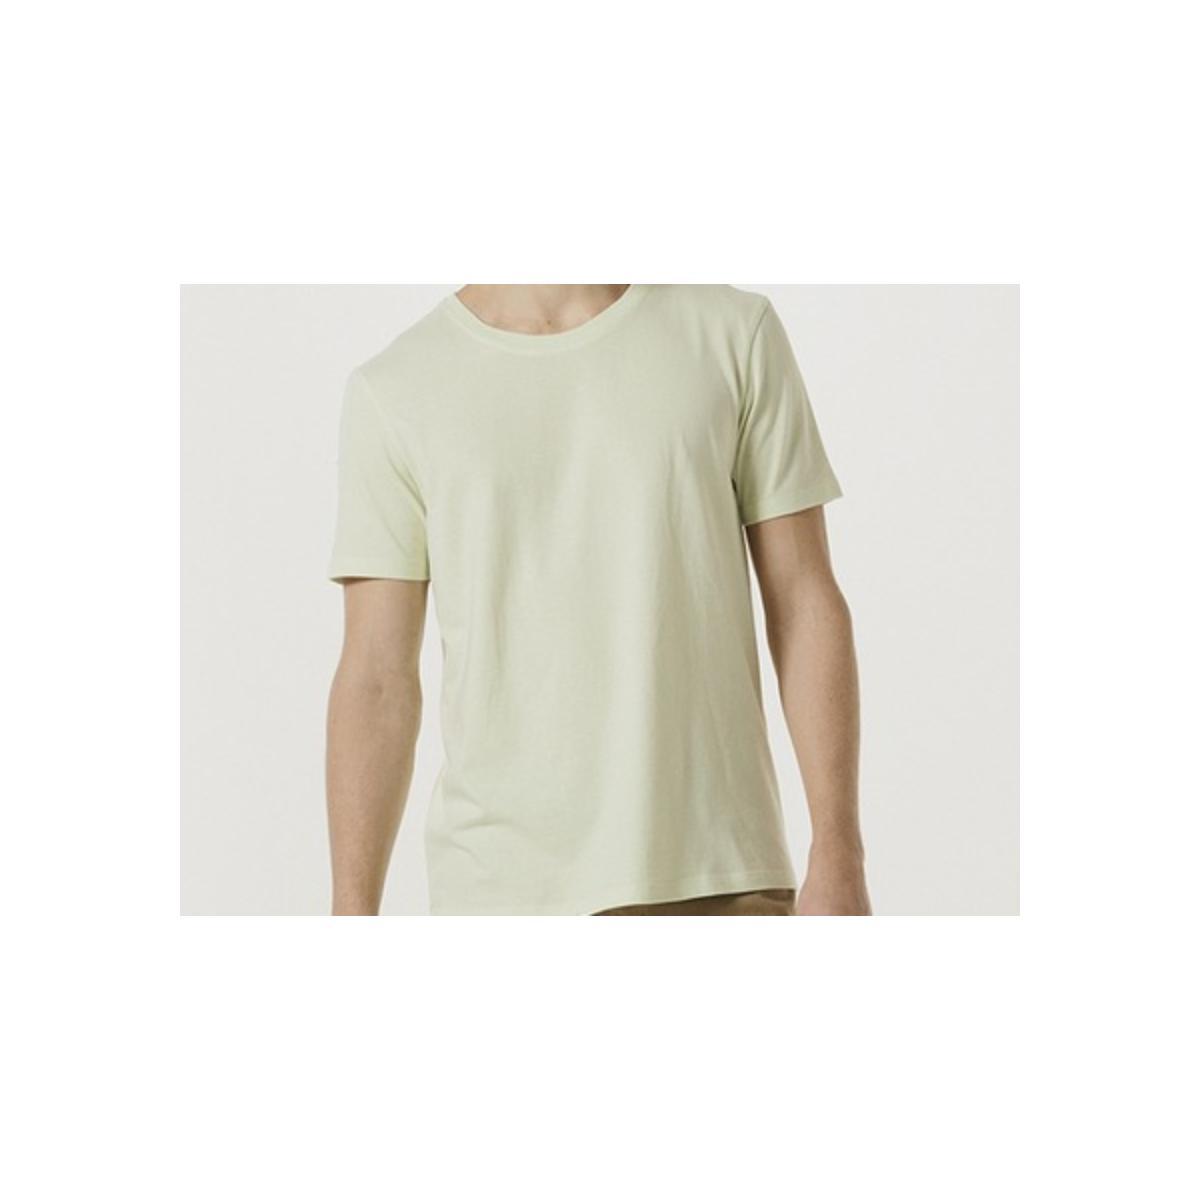 Camiseta Masculina Hering 0201 Wb8en Verde Claro